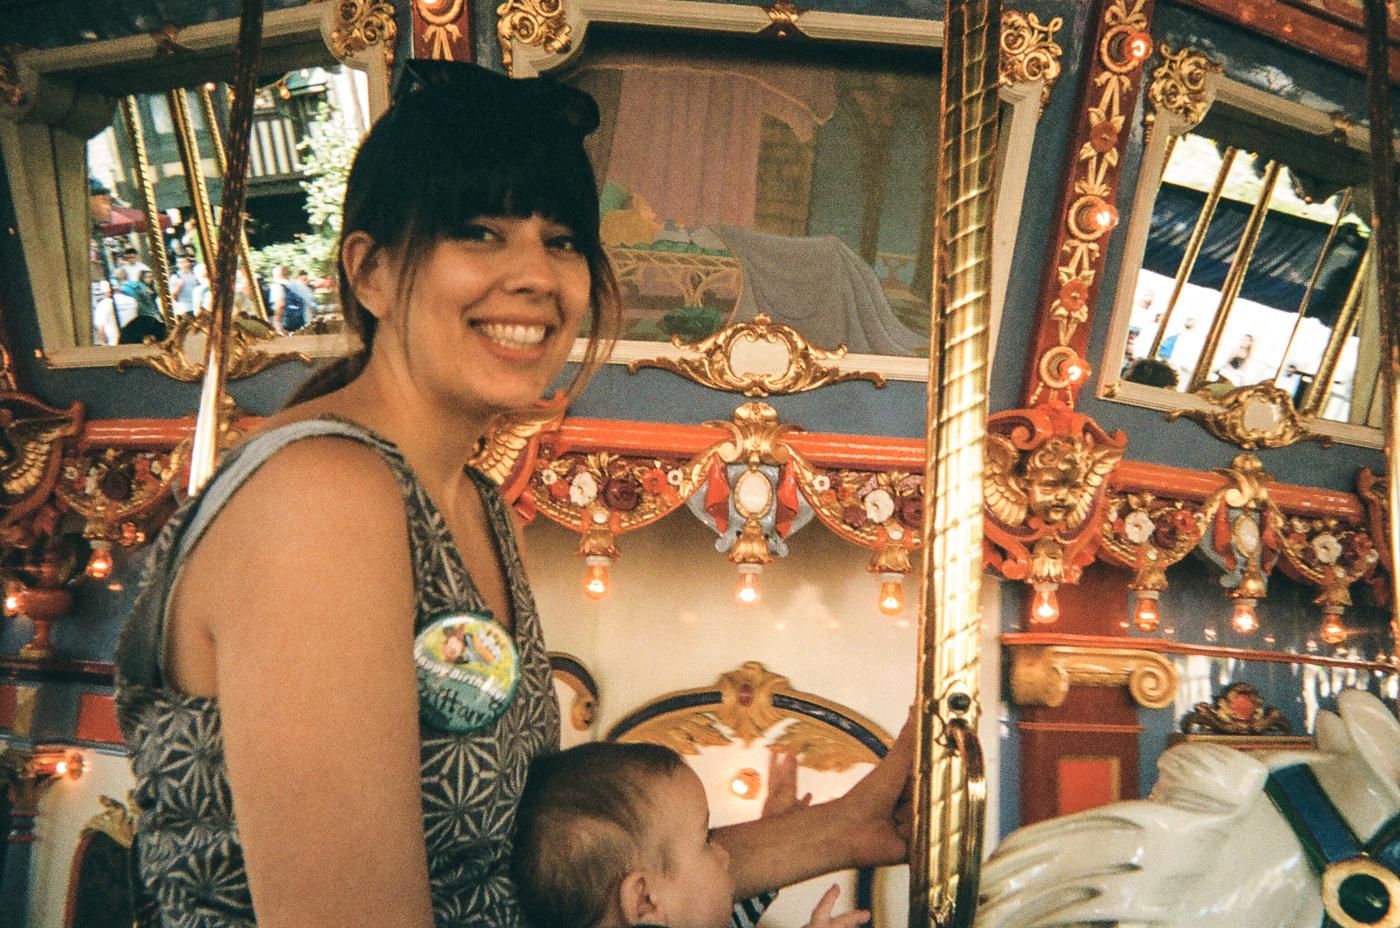 Spending your birthday at Disneyland